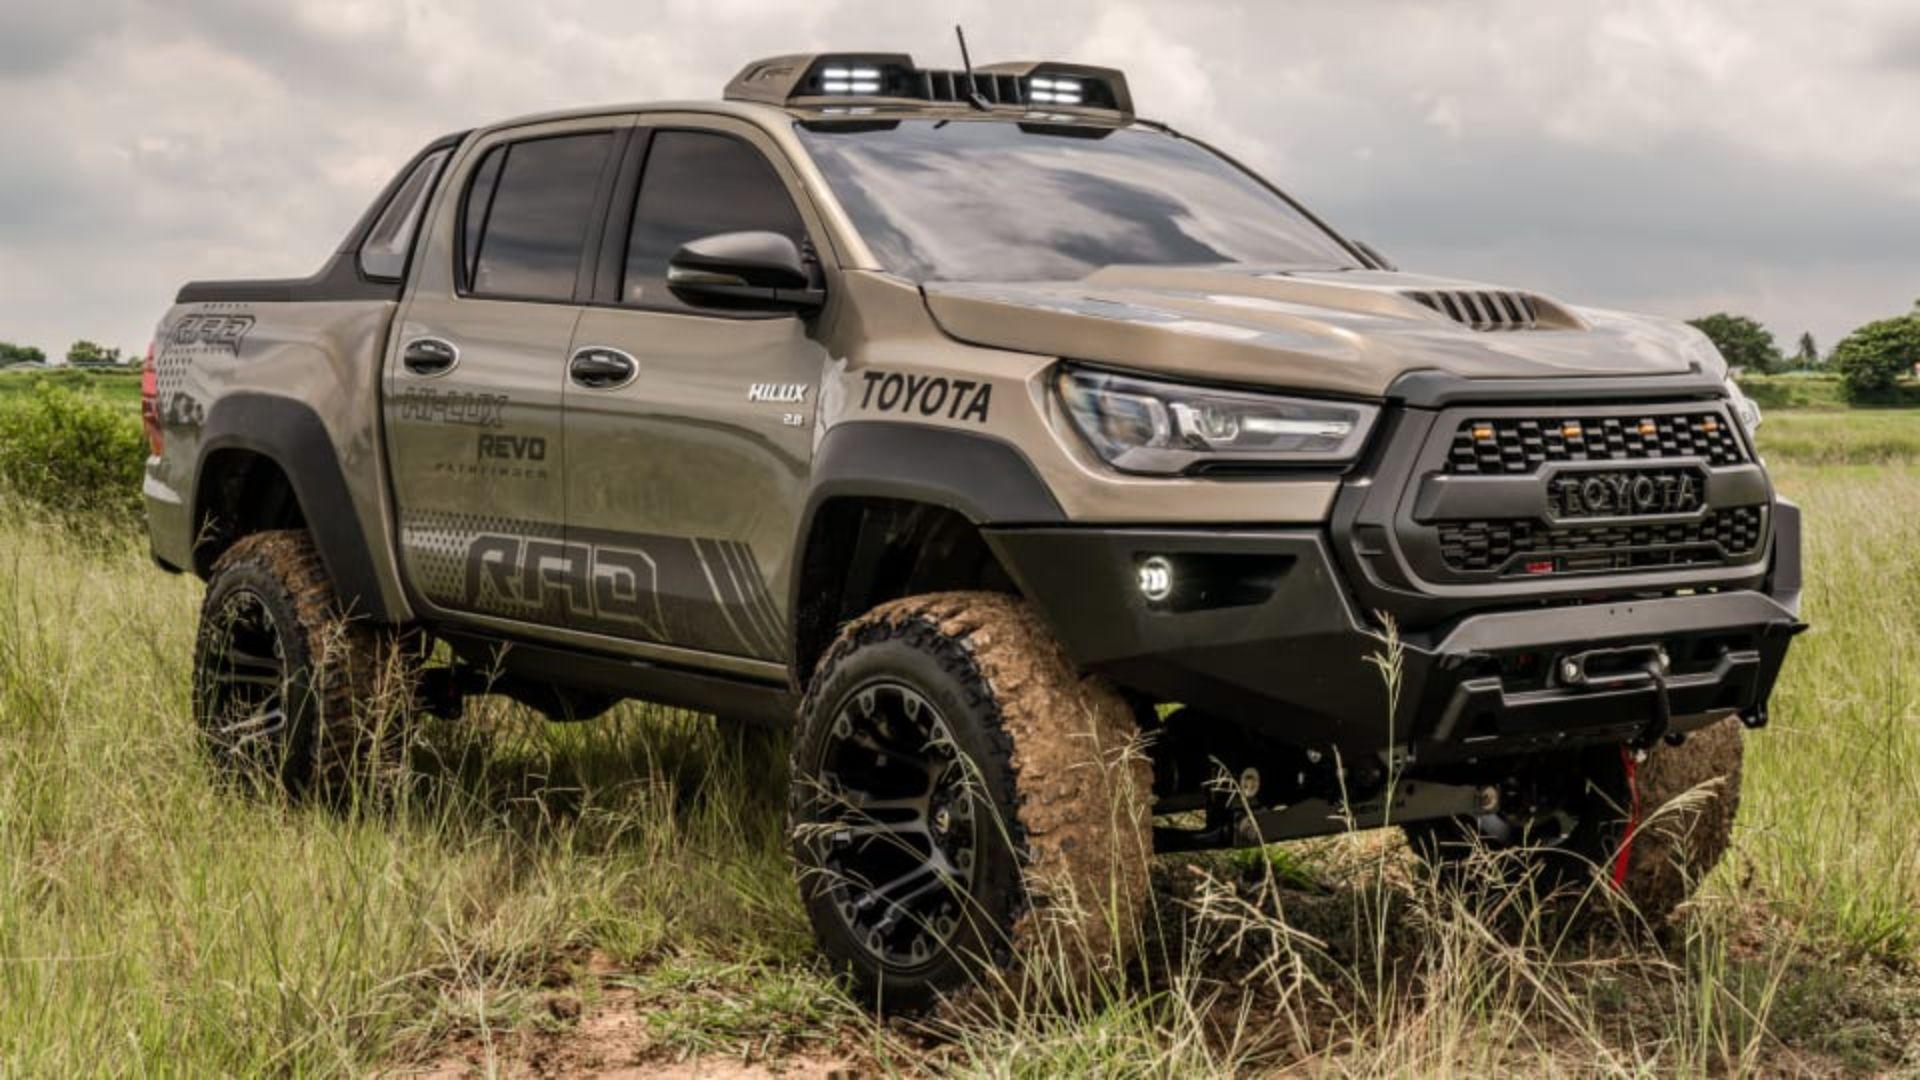 Toyota-Hilux-Pathfinder-by-RAD-3